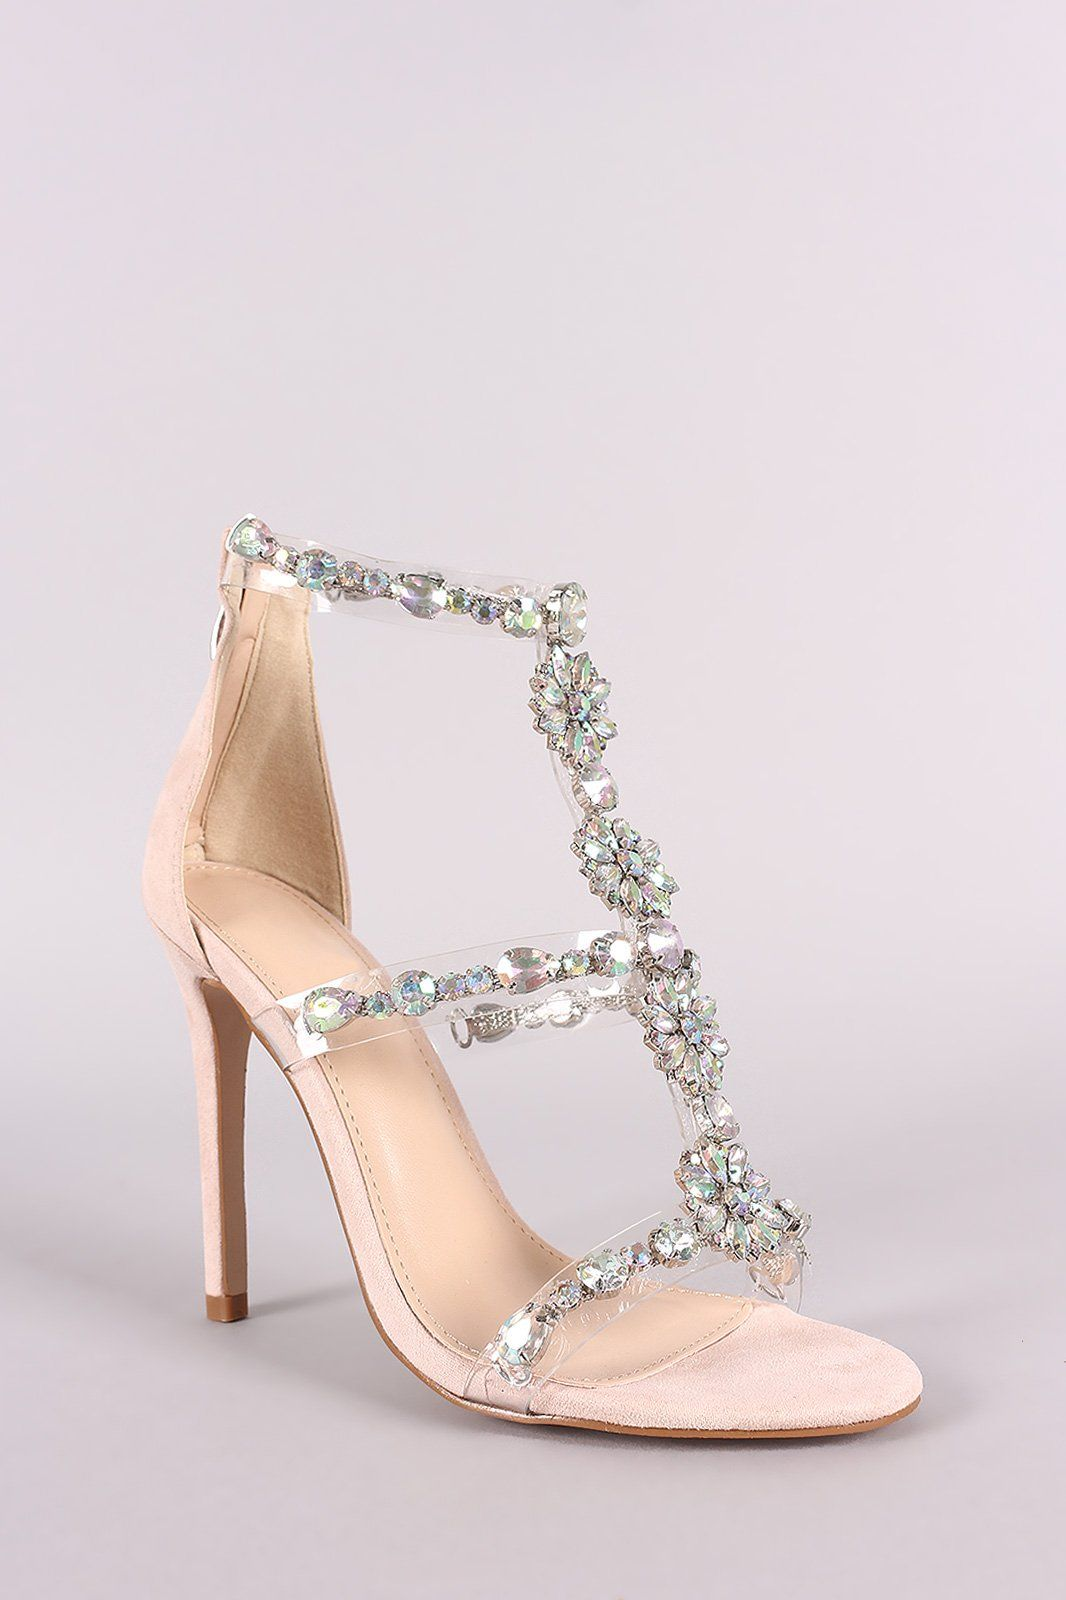 684132ec061 Qupid Clear Jewel Embellished T-Strap Stiletto Heel